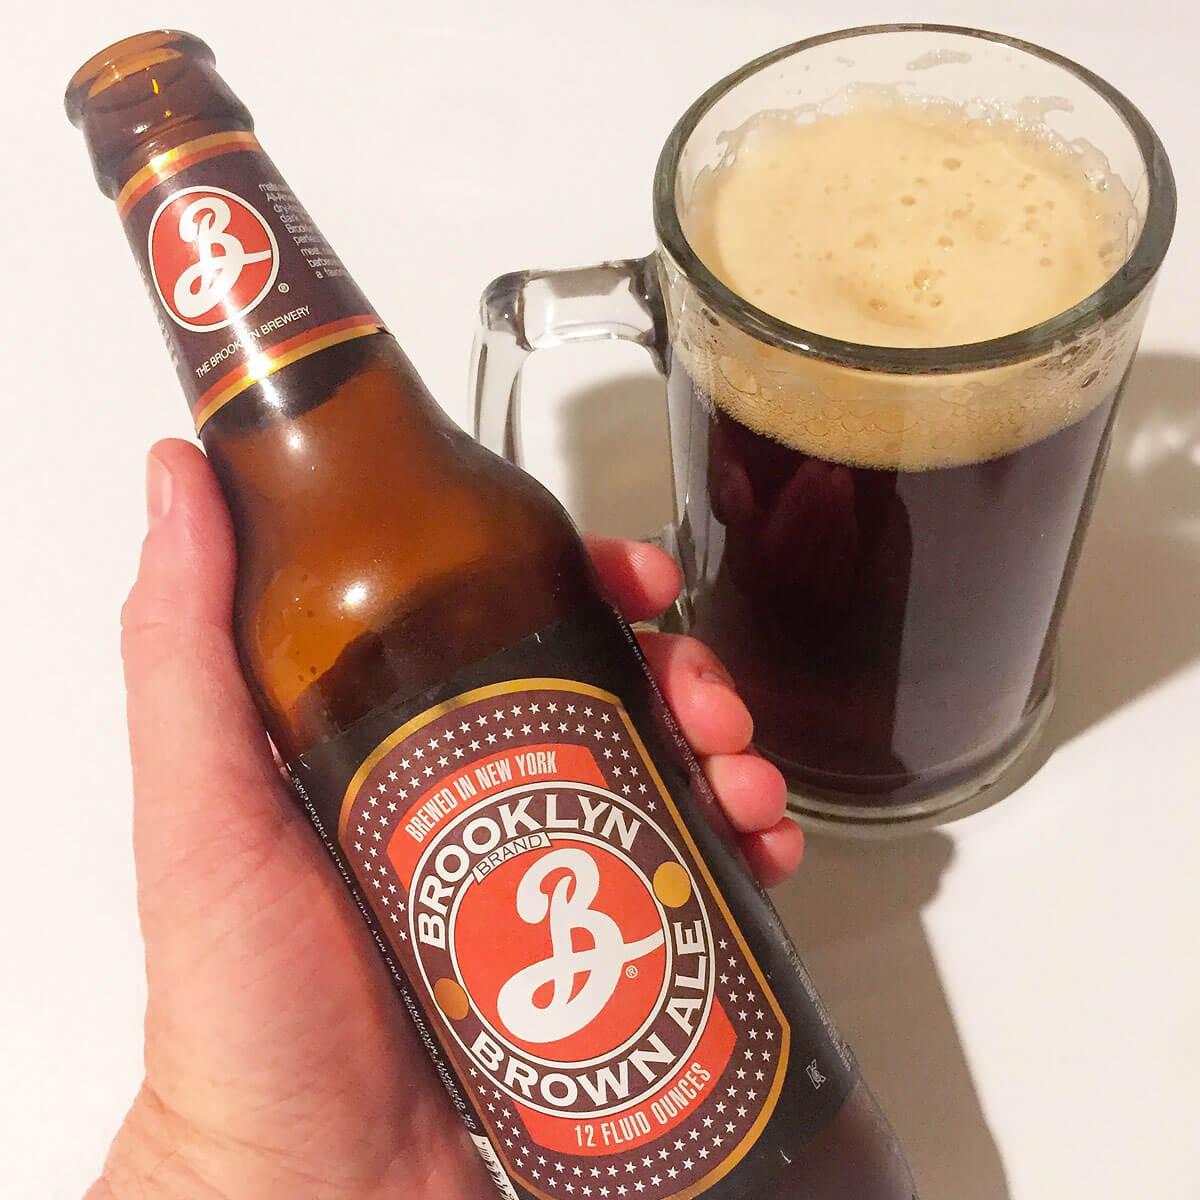 Brooklyn Brown Ale, an American Brown Ale by Brooklyn Brewery